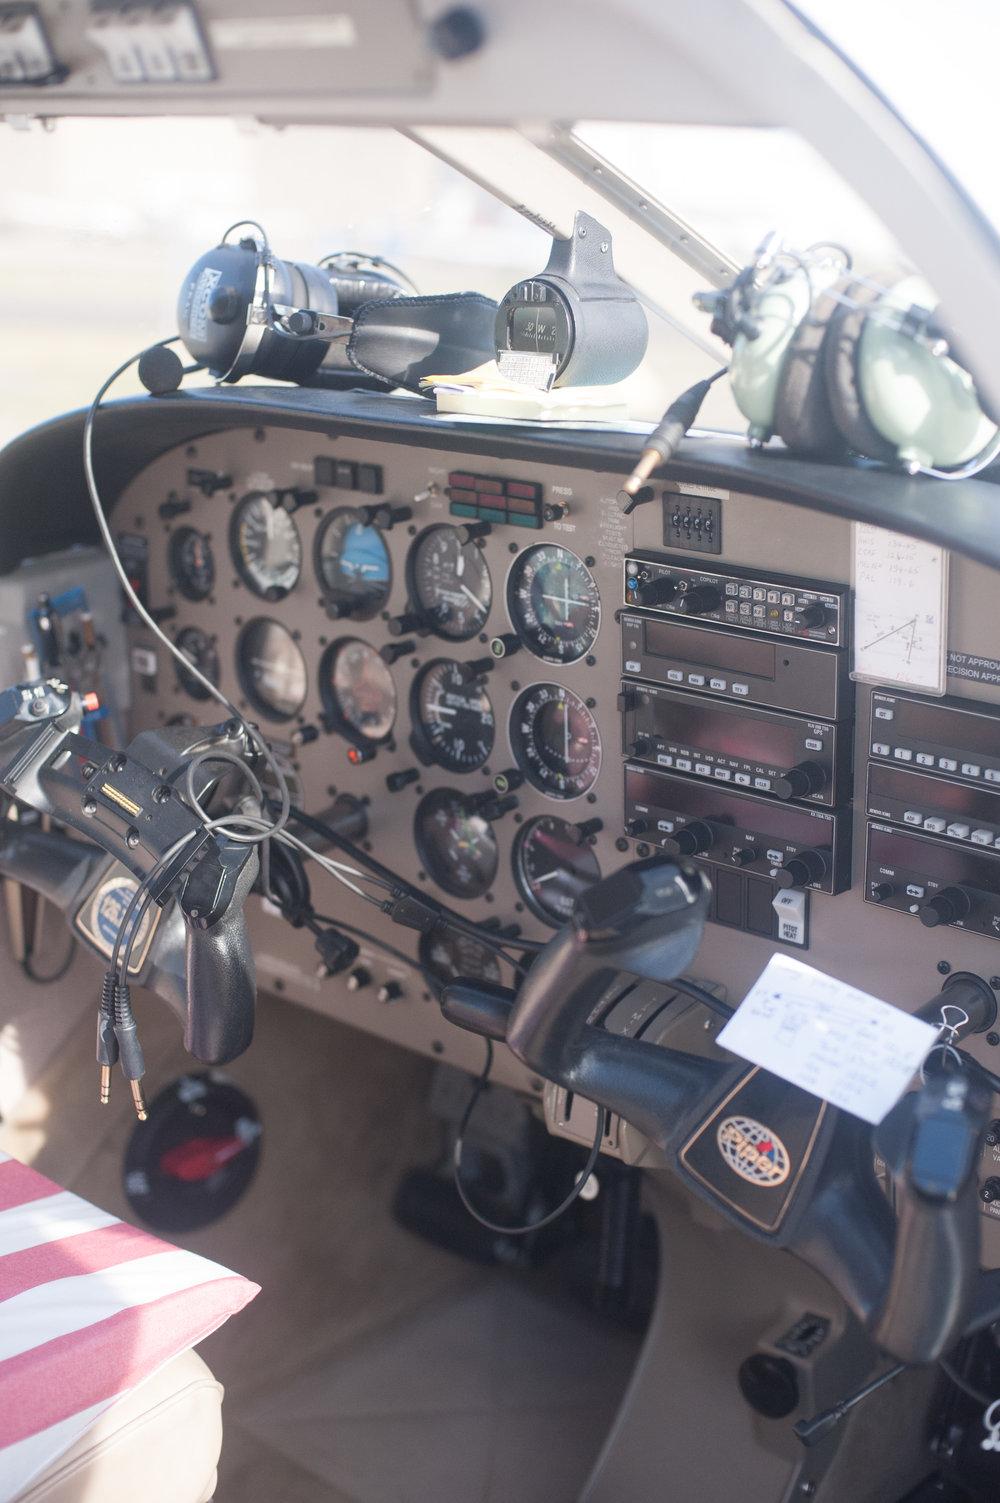 ivv_fran_pilot_petrolette_jo_mcewan_11.jpeg